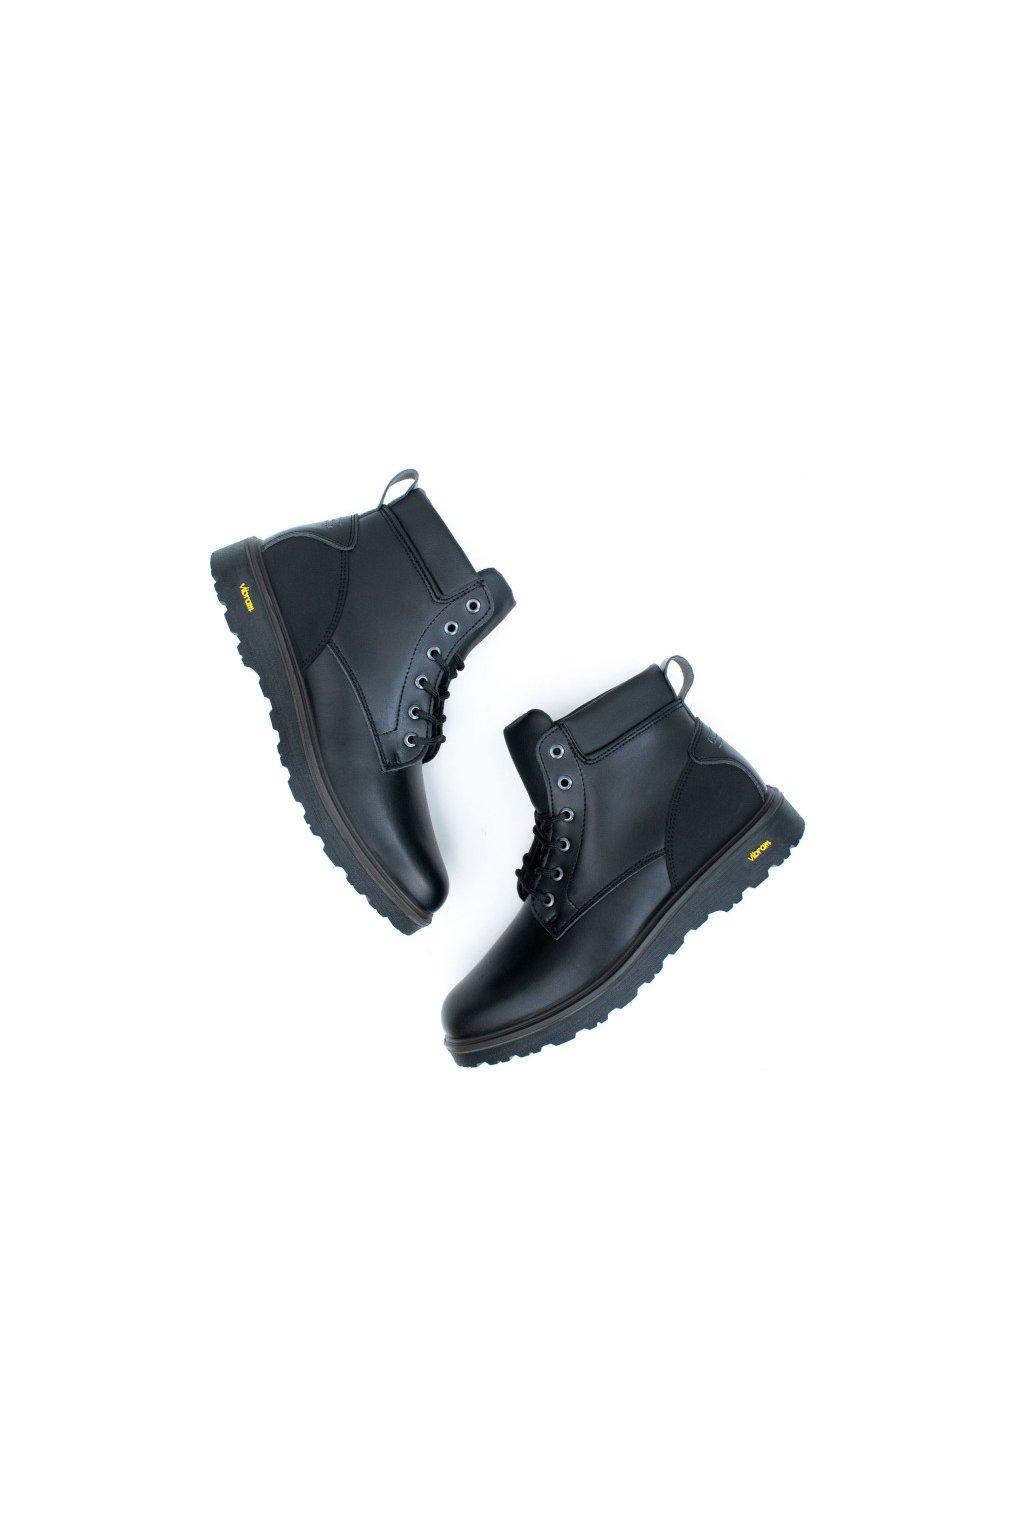 "WVSport Čierne vodotesné členkové topánky ""Waterproof Urban Boots"""